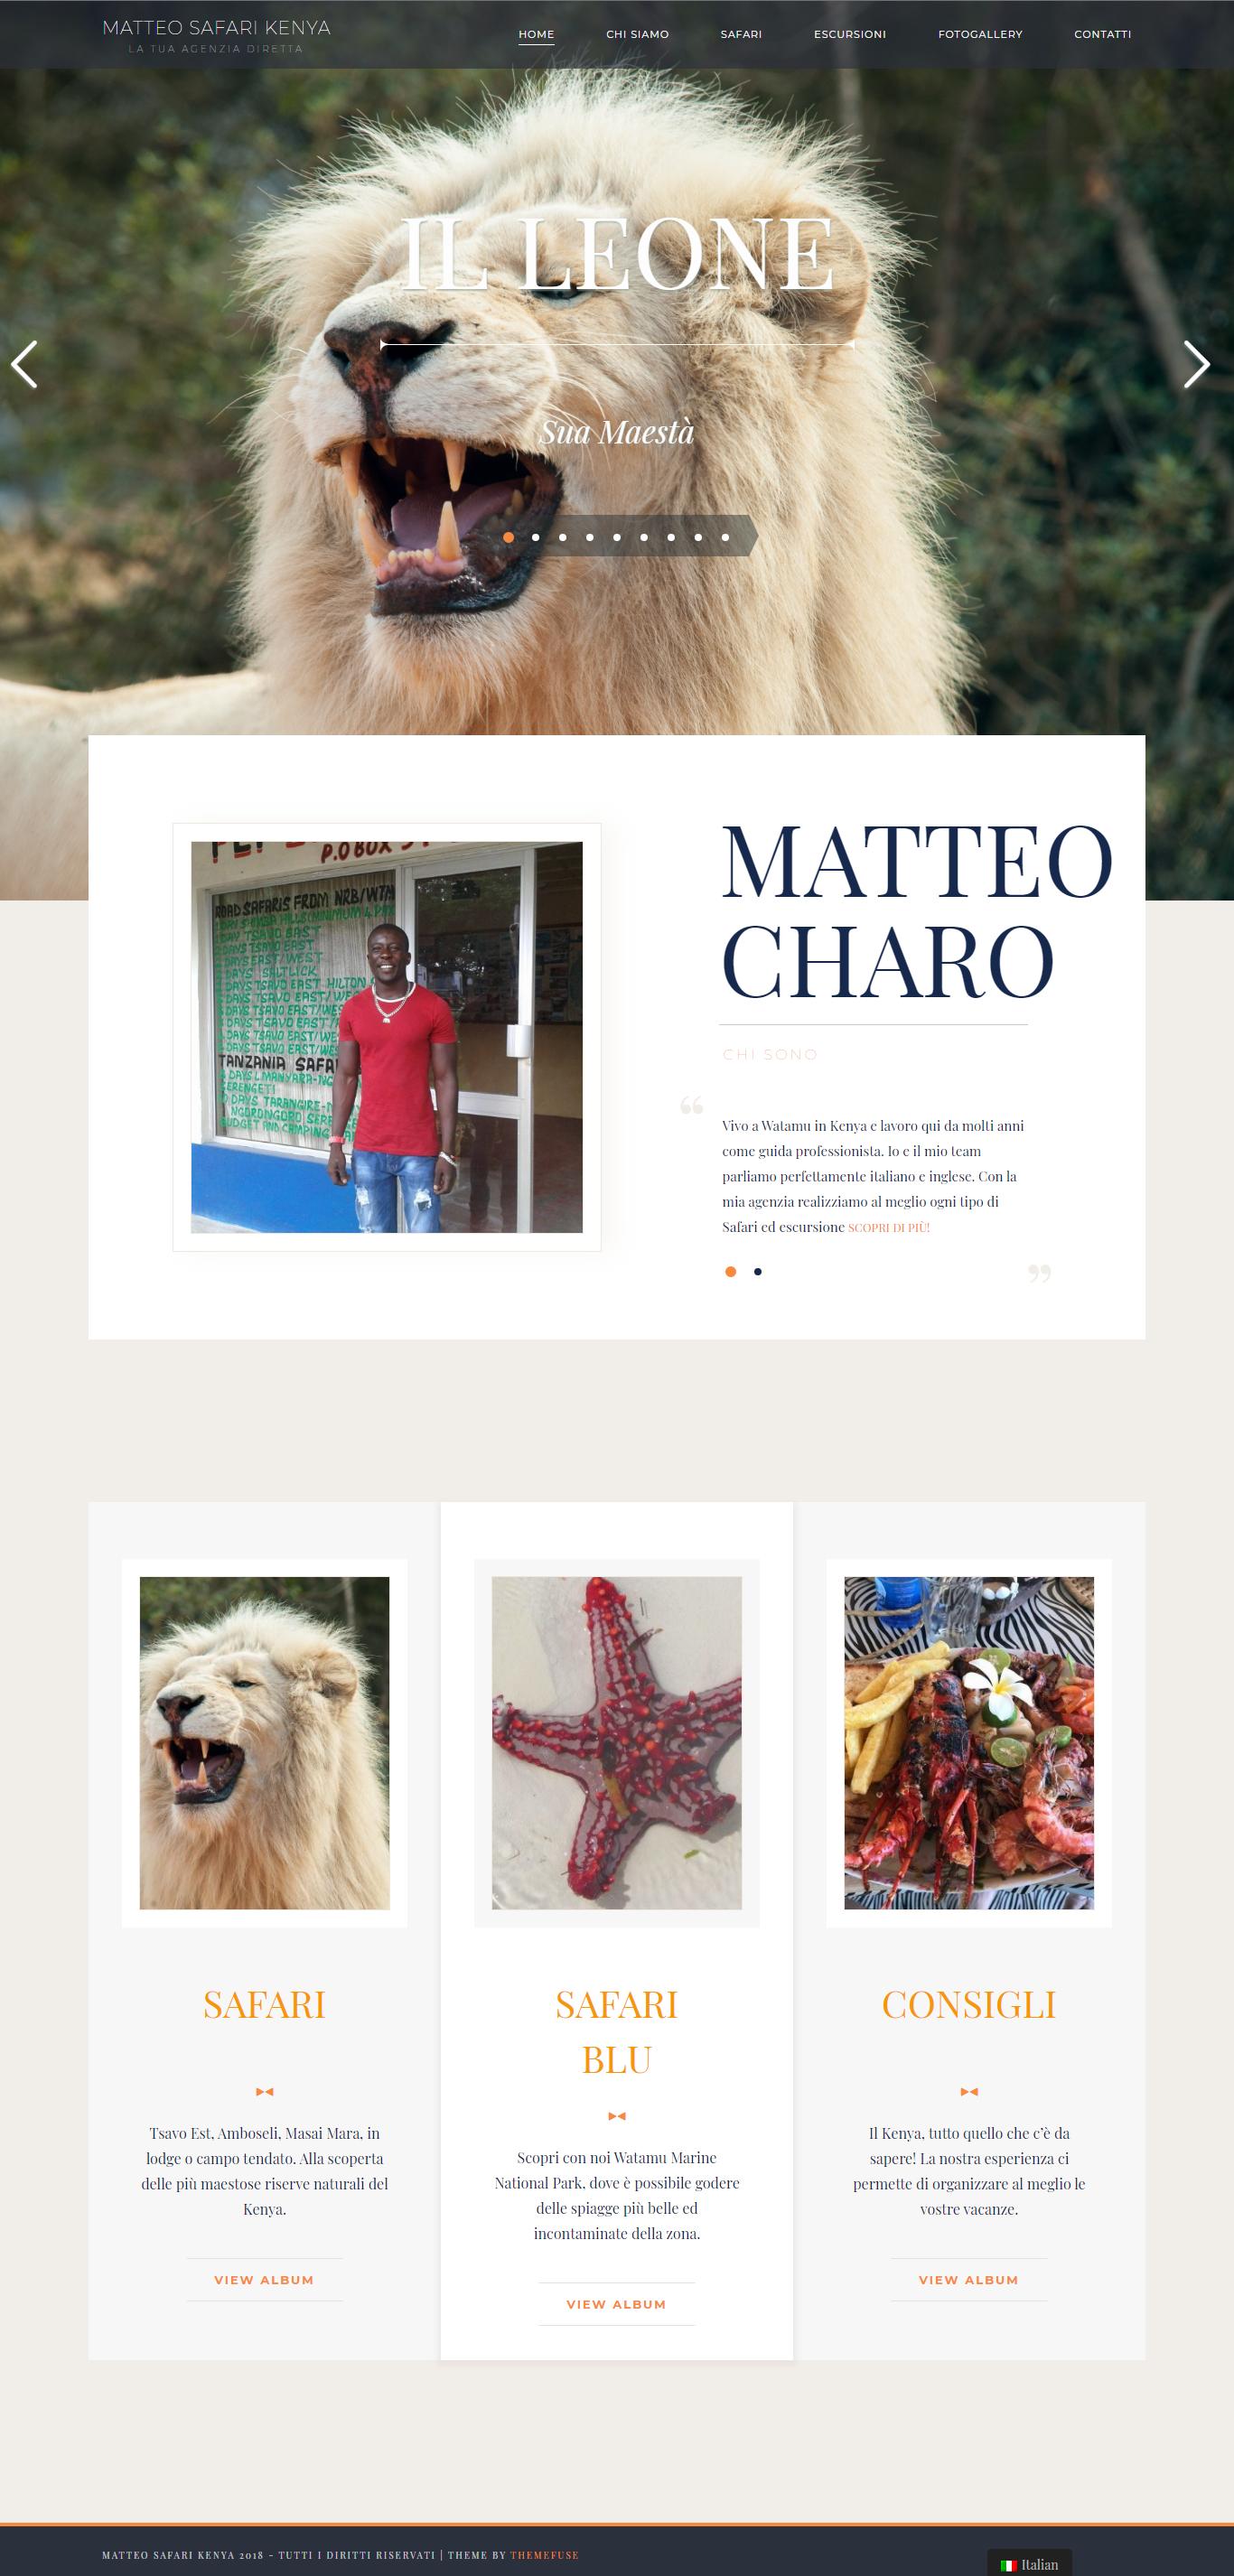 Matteo Safari Kenya